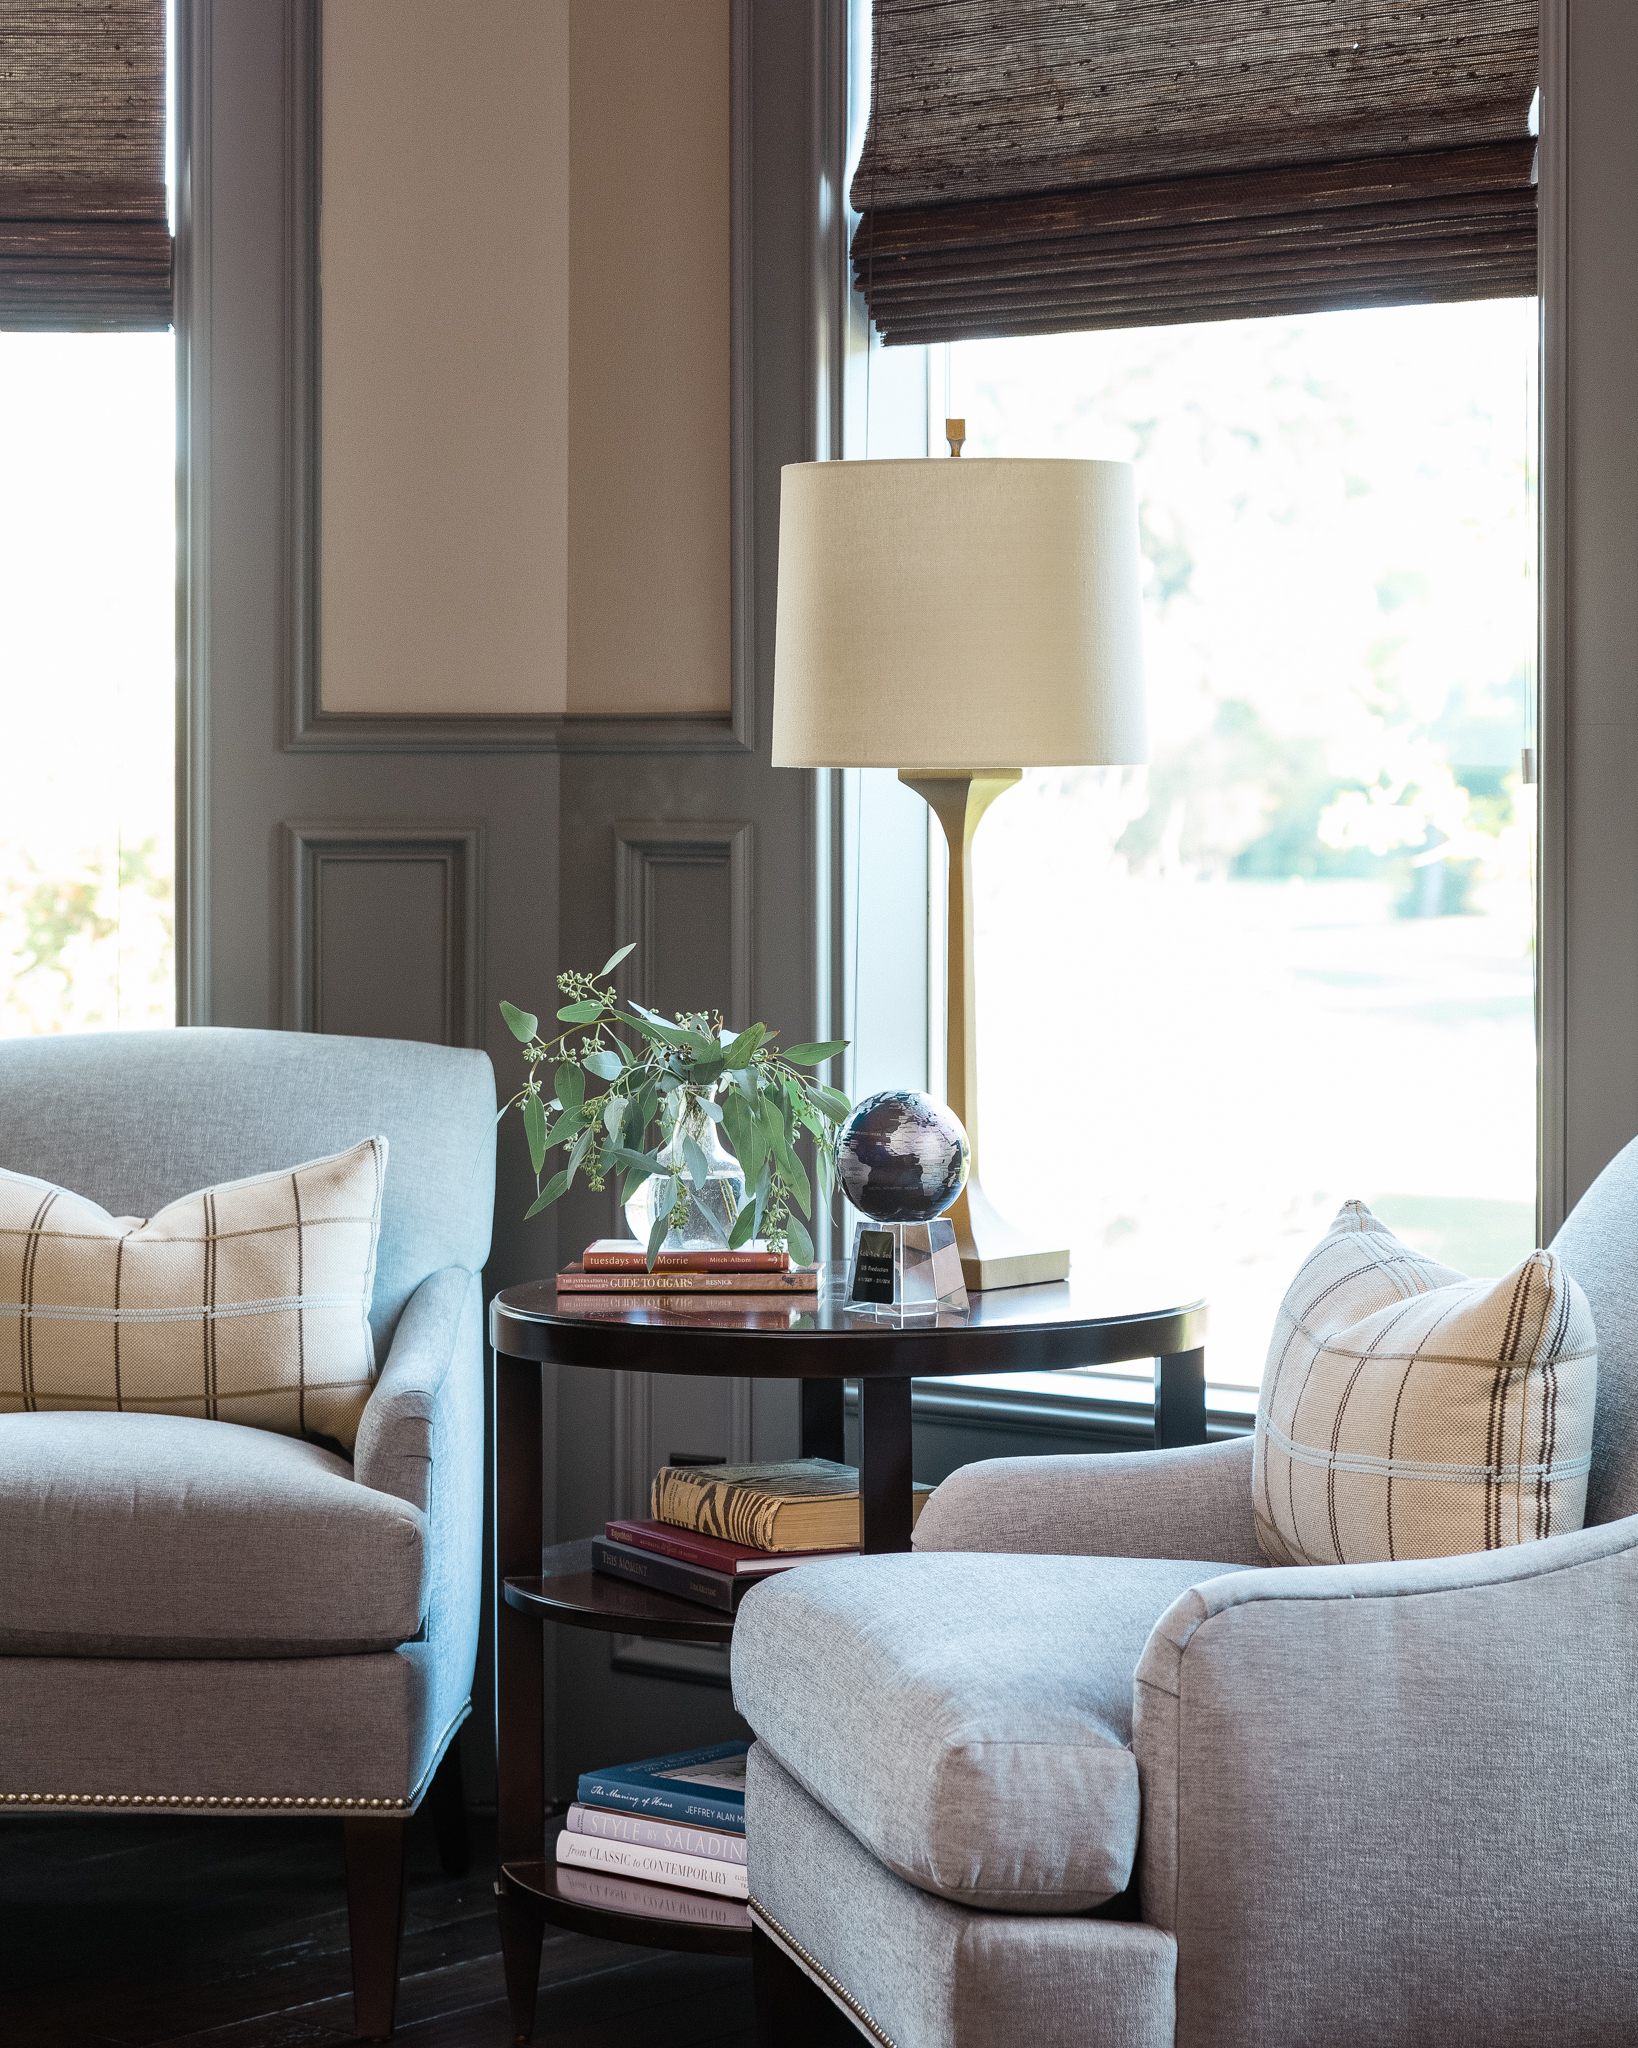 Home Office Seating   Carla Aston - Designer,  Colleen Scott - Photographer #study #homeoffice #paneling #homedecorideas #decorating